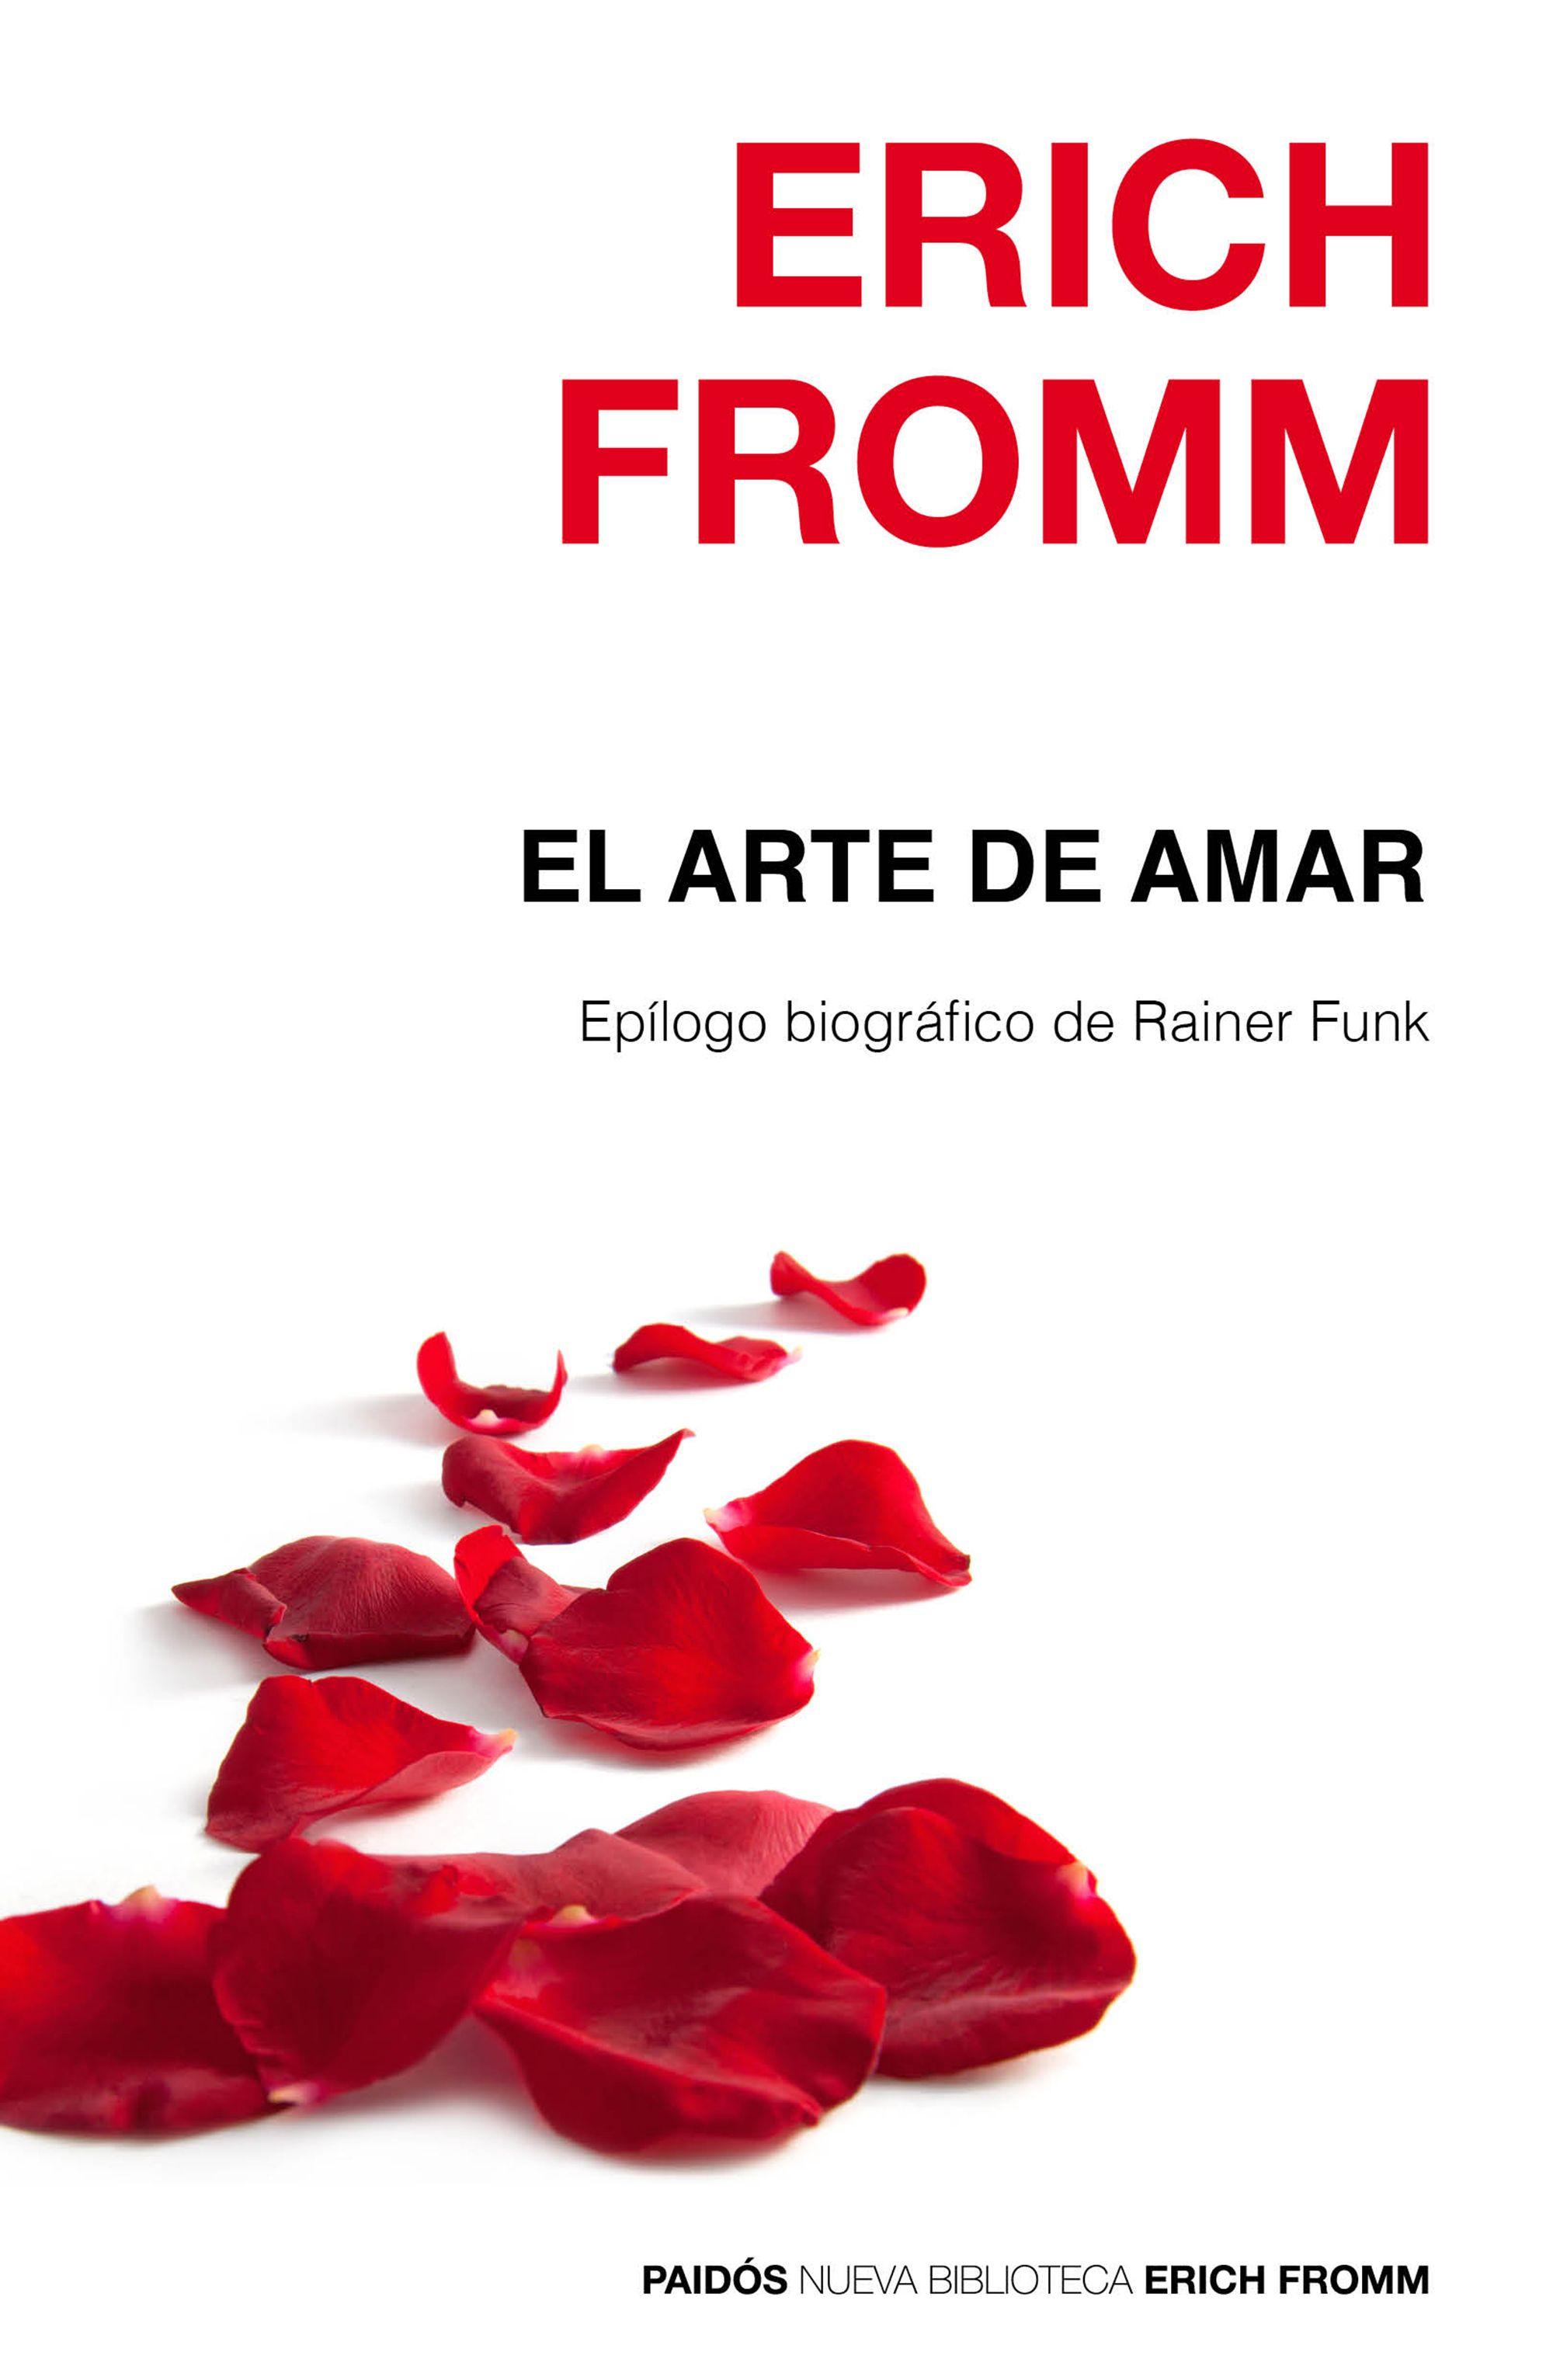 El arte de amar epilogo de rainer funk erich fromm 9788449331893